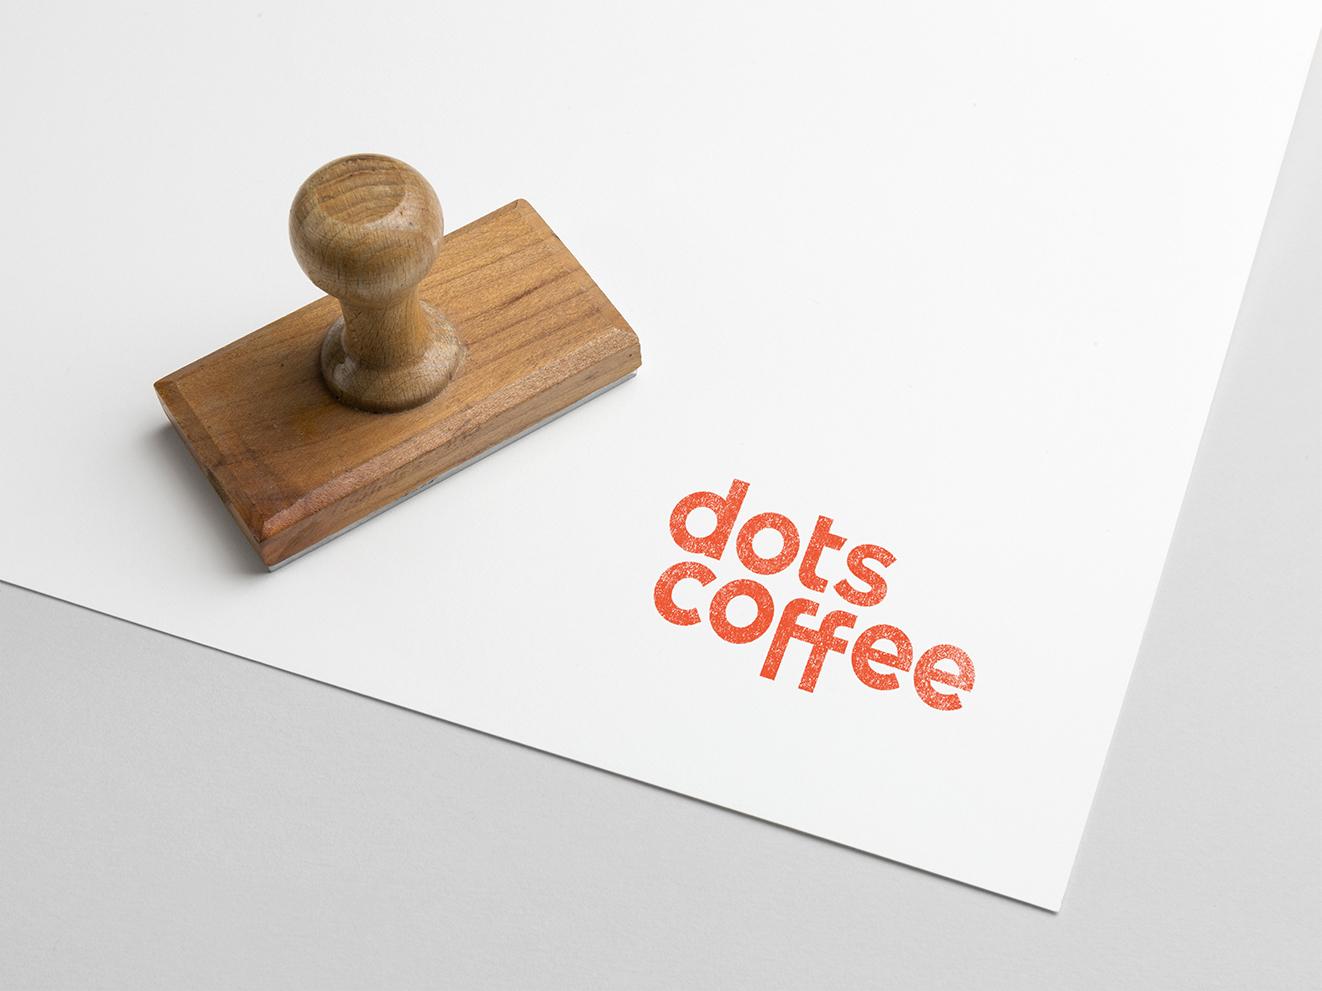 Dots Coffee logo stamp